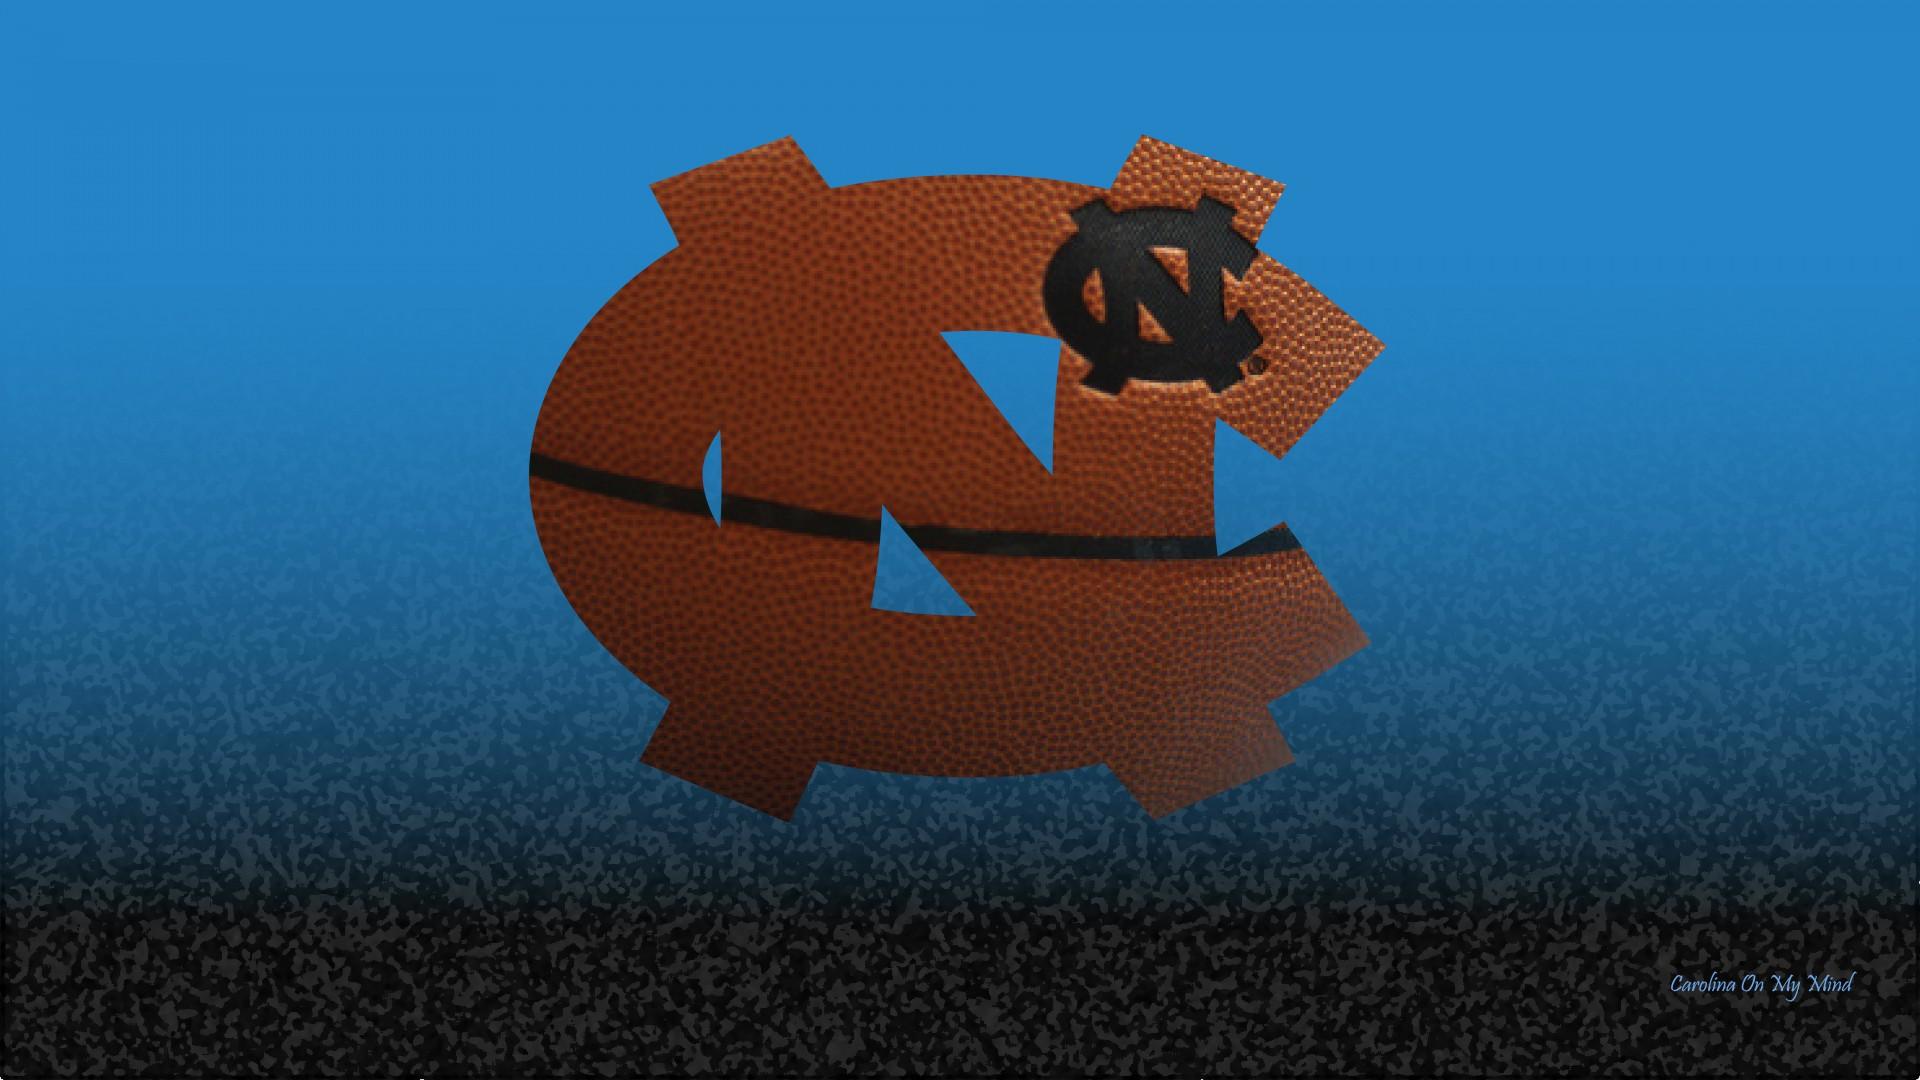 UNC Wallpaper   Basketball Grain NC Logo on Blue and Black Textured 1920x1080